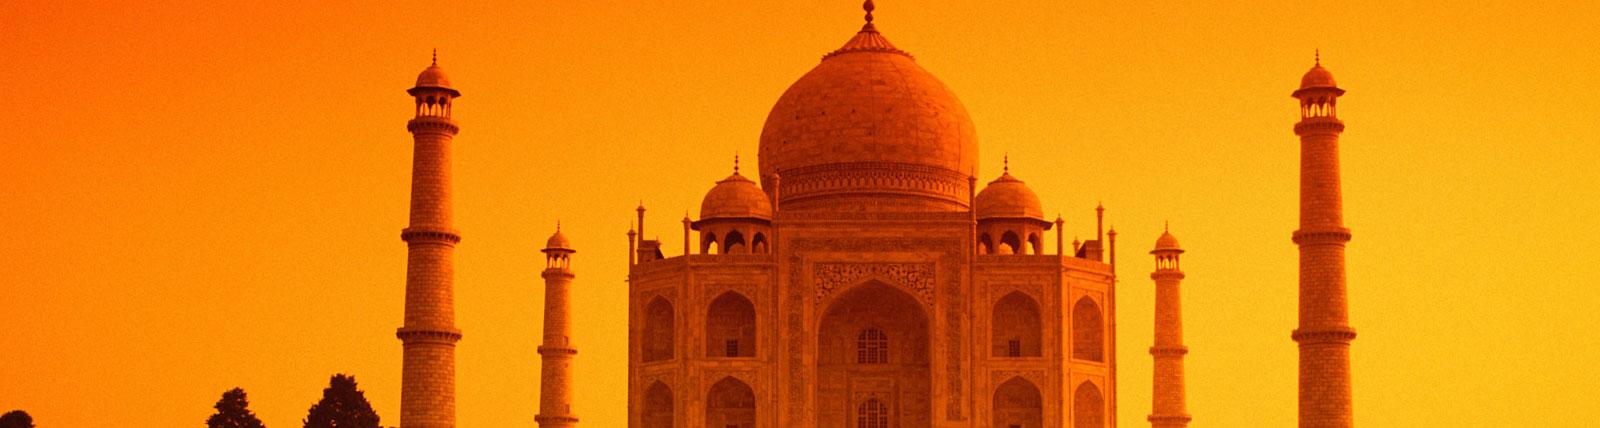 Mystical India with Pushkar Camel Fair | Alumni